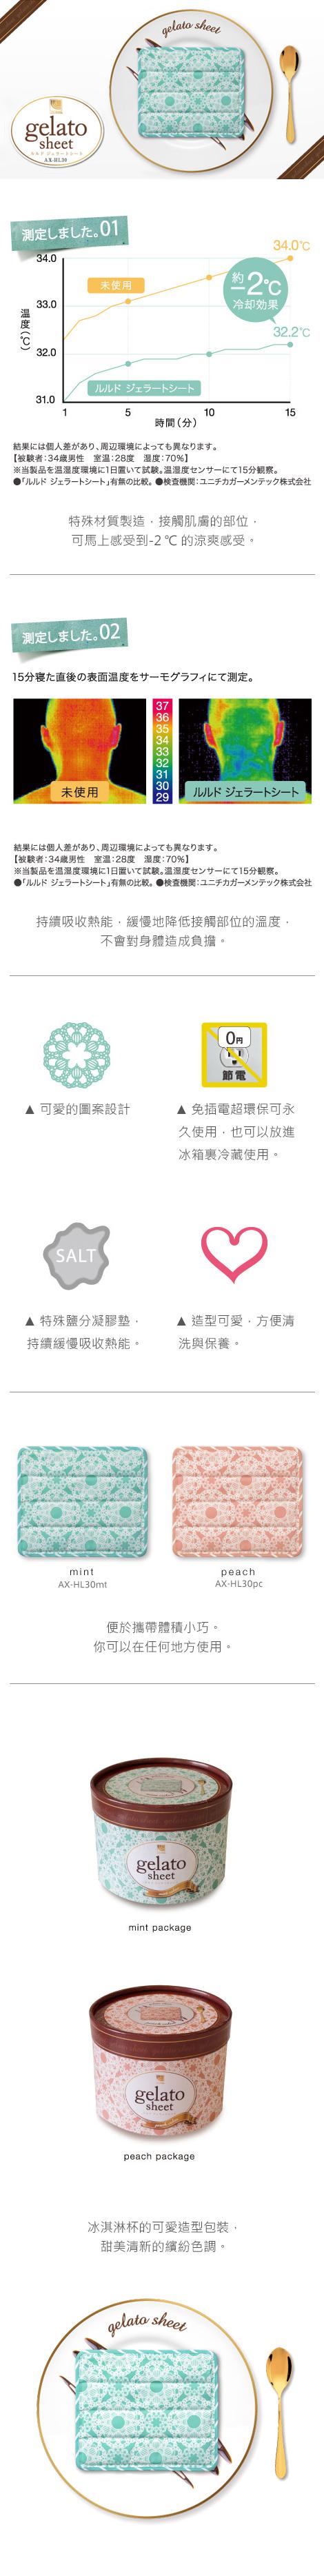 LOURDES 鹽分凝膠清涼墊 AX-HL30 (pc蜜桃粉)